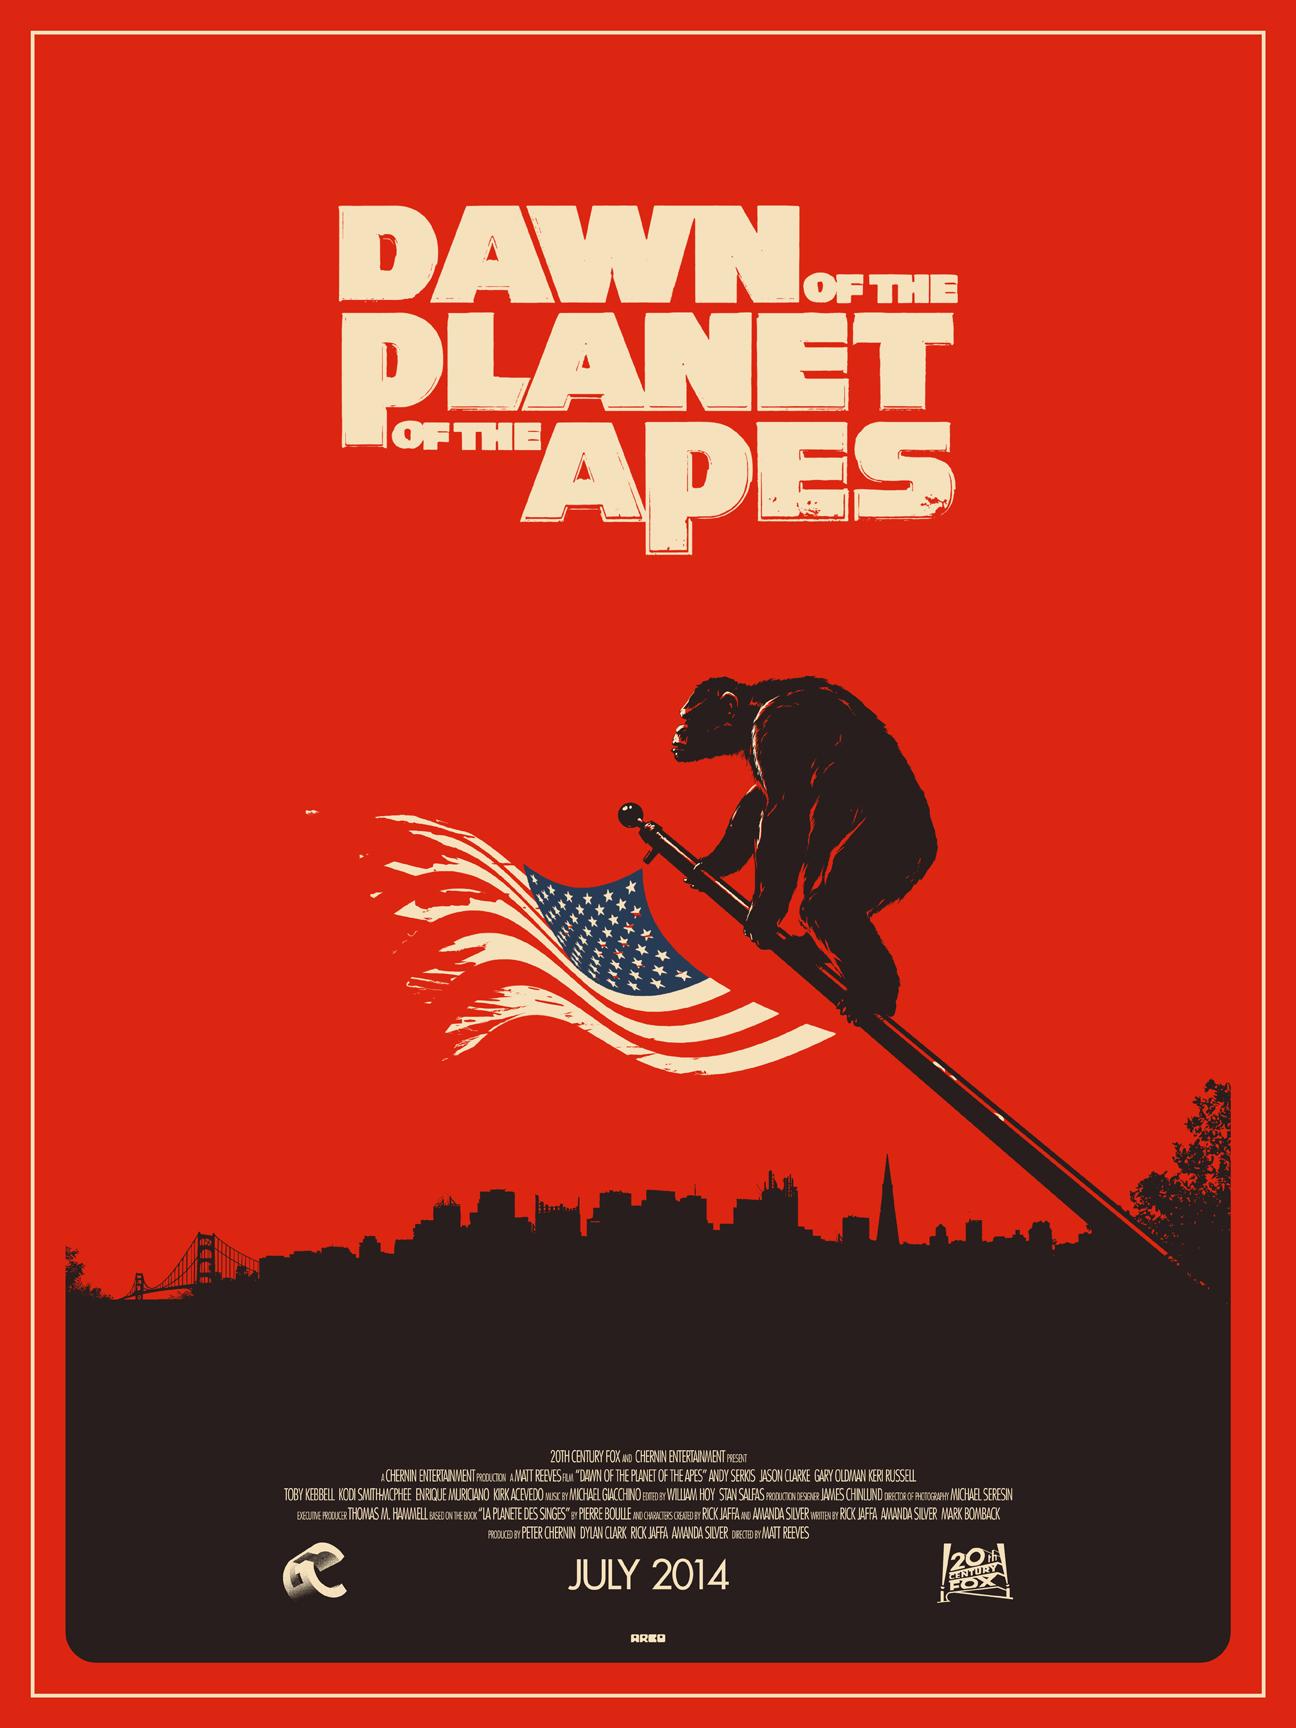 apes-poster-by-matt-ferguson